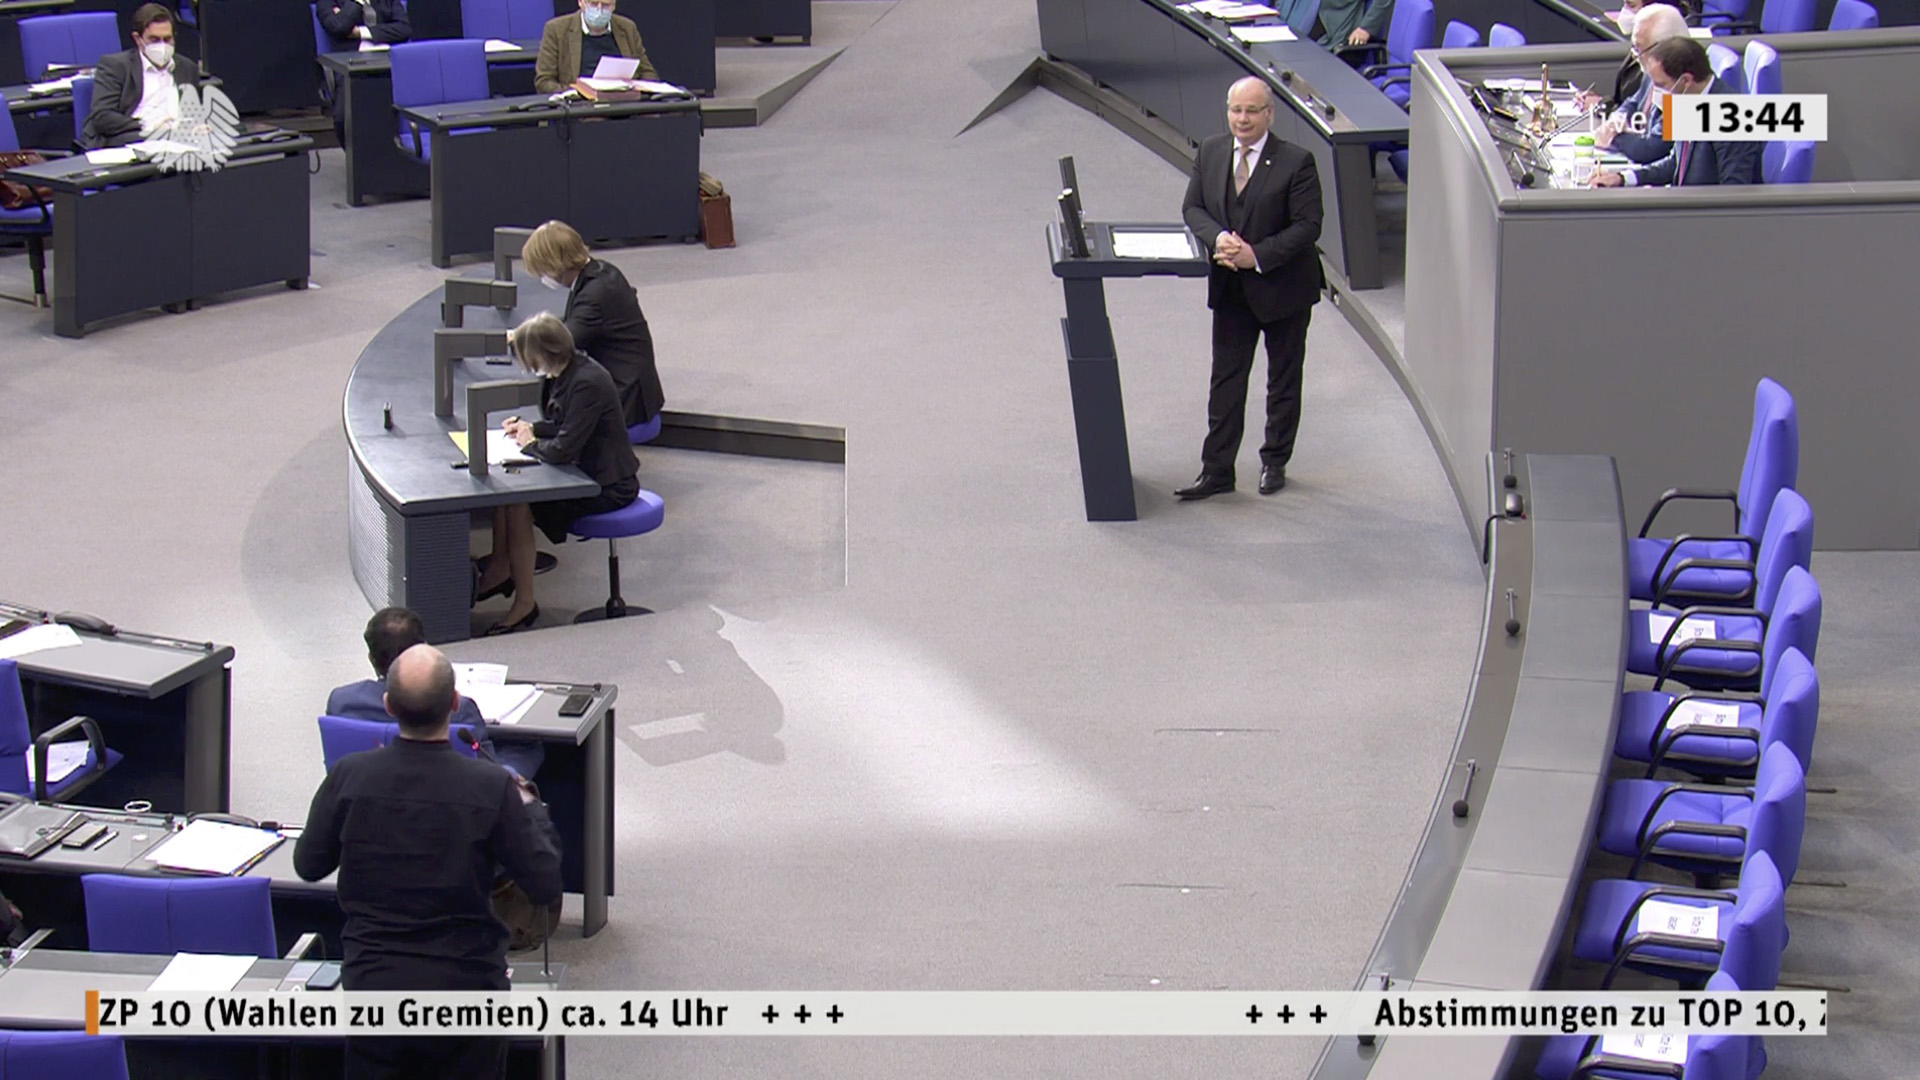 21kw08 Rede im Bundestag